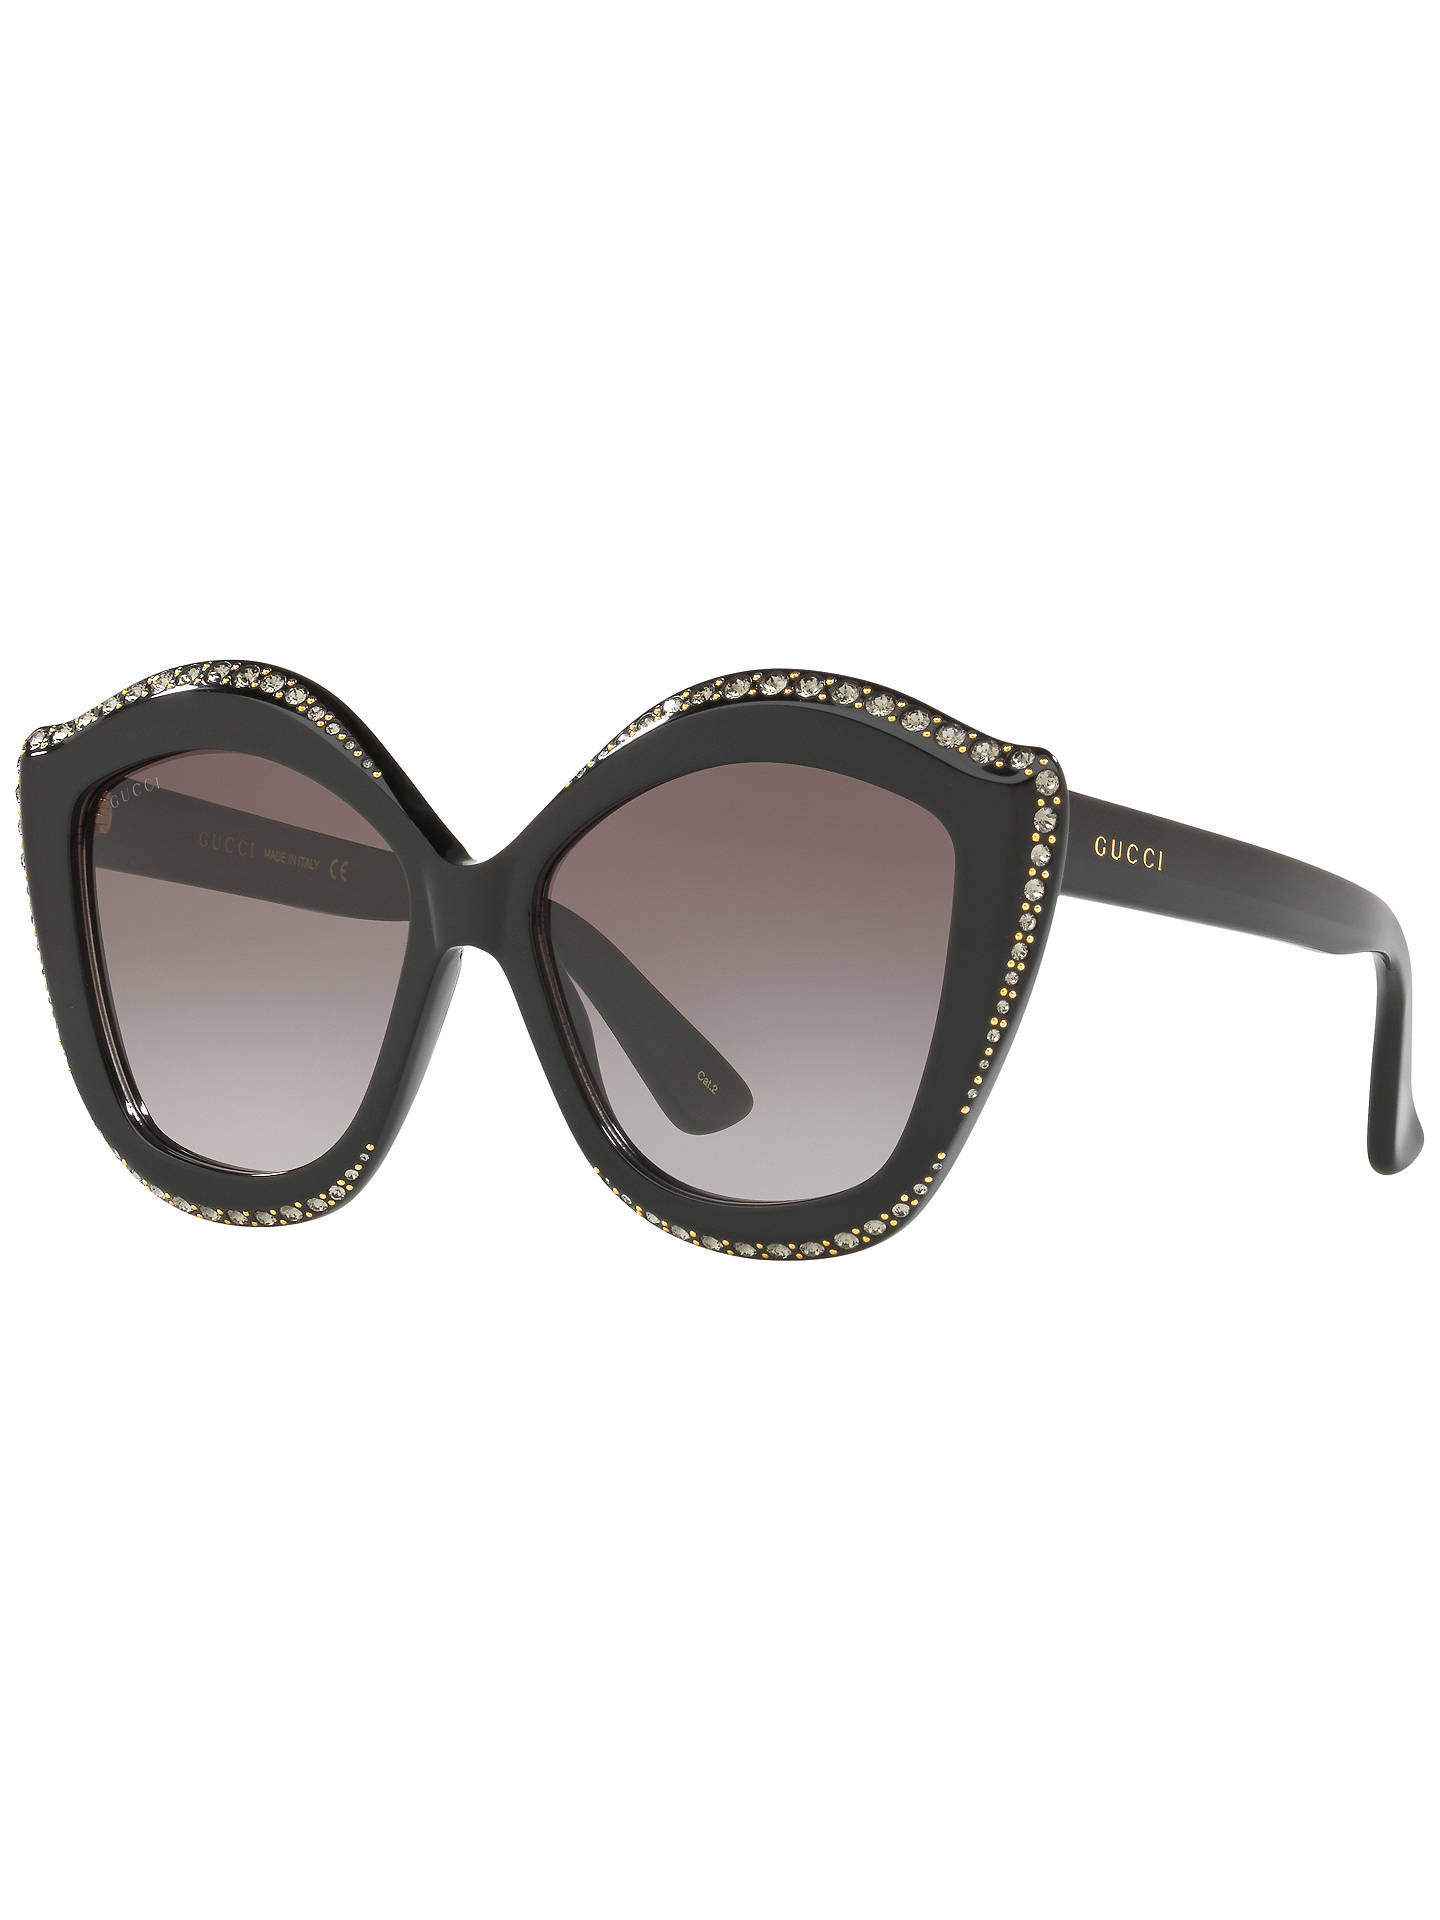 e9a4cf62027 Gucci GG0118S Embellished Cat s Eye Sunglasses at John Lewis   Partners